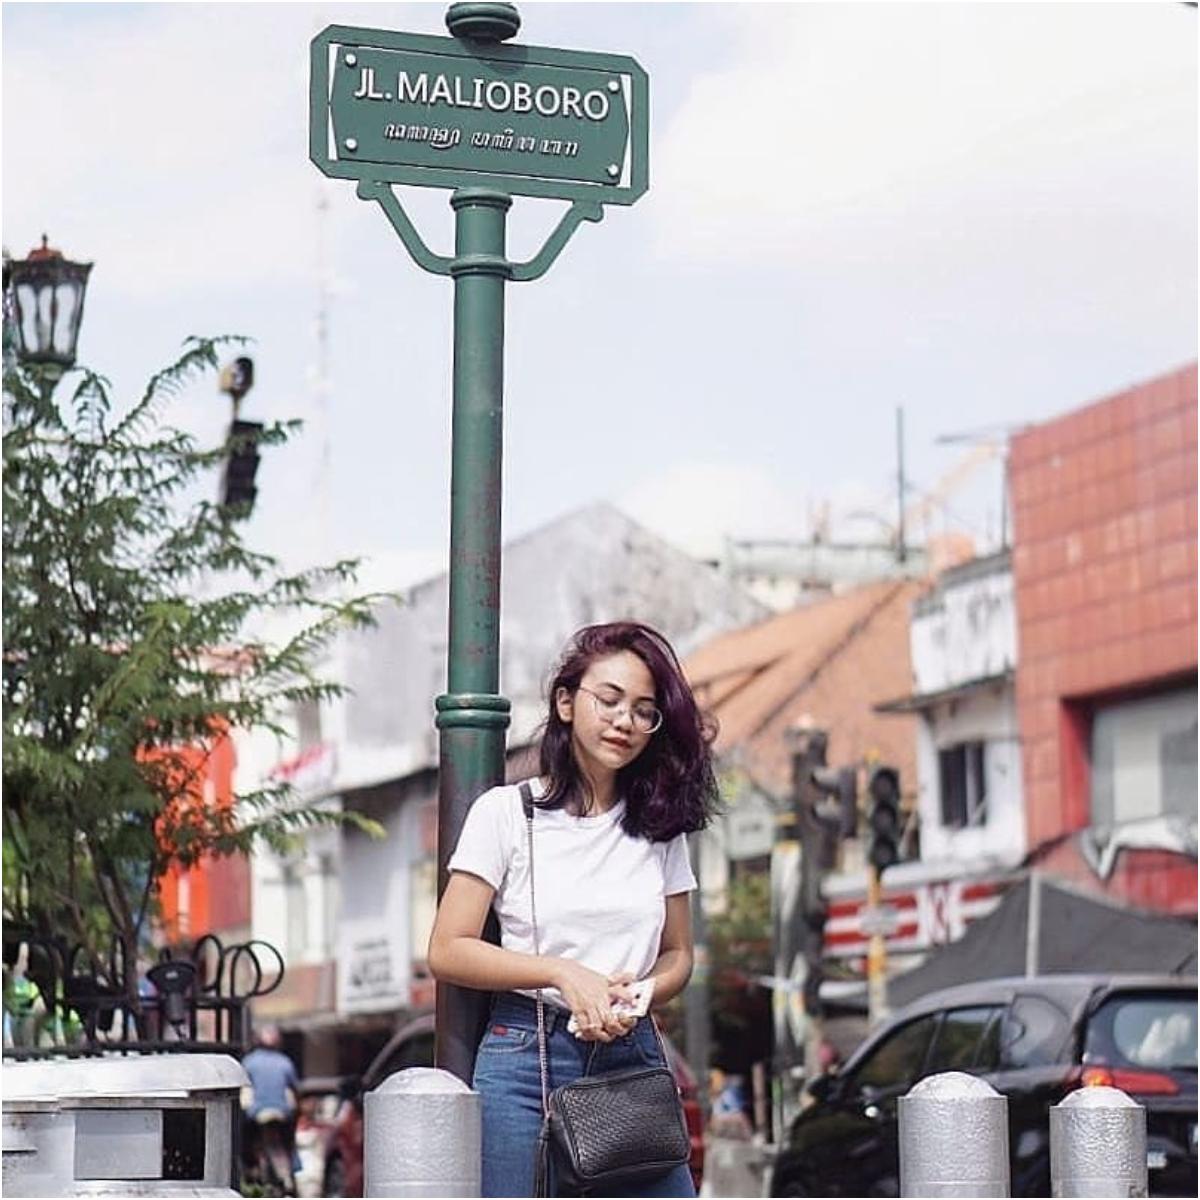 Ekspektasi  Jalan ke Jogja tidak sah tanpa berfoto di depan papan jalan  Malioboro 86dc04f412